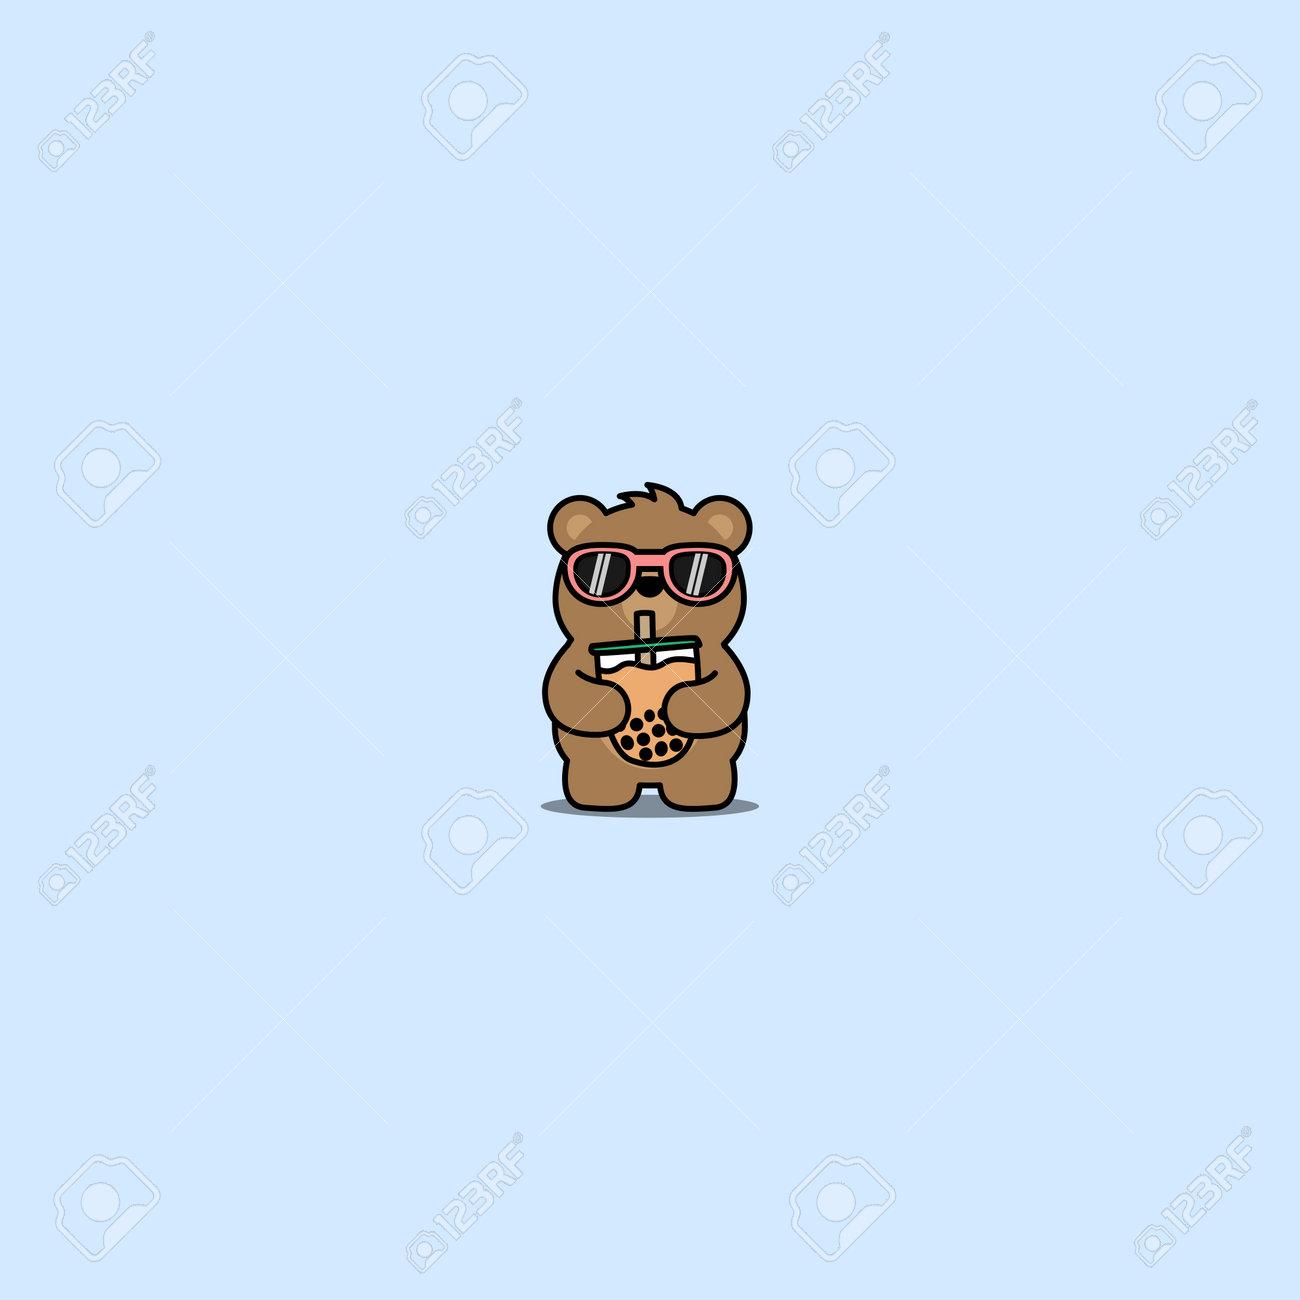 Cute bear with sunglasses drinking bubble tea cartoon, vector illustration - 164044989